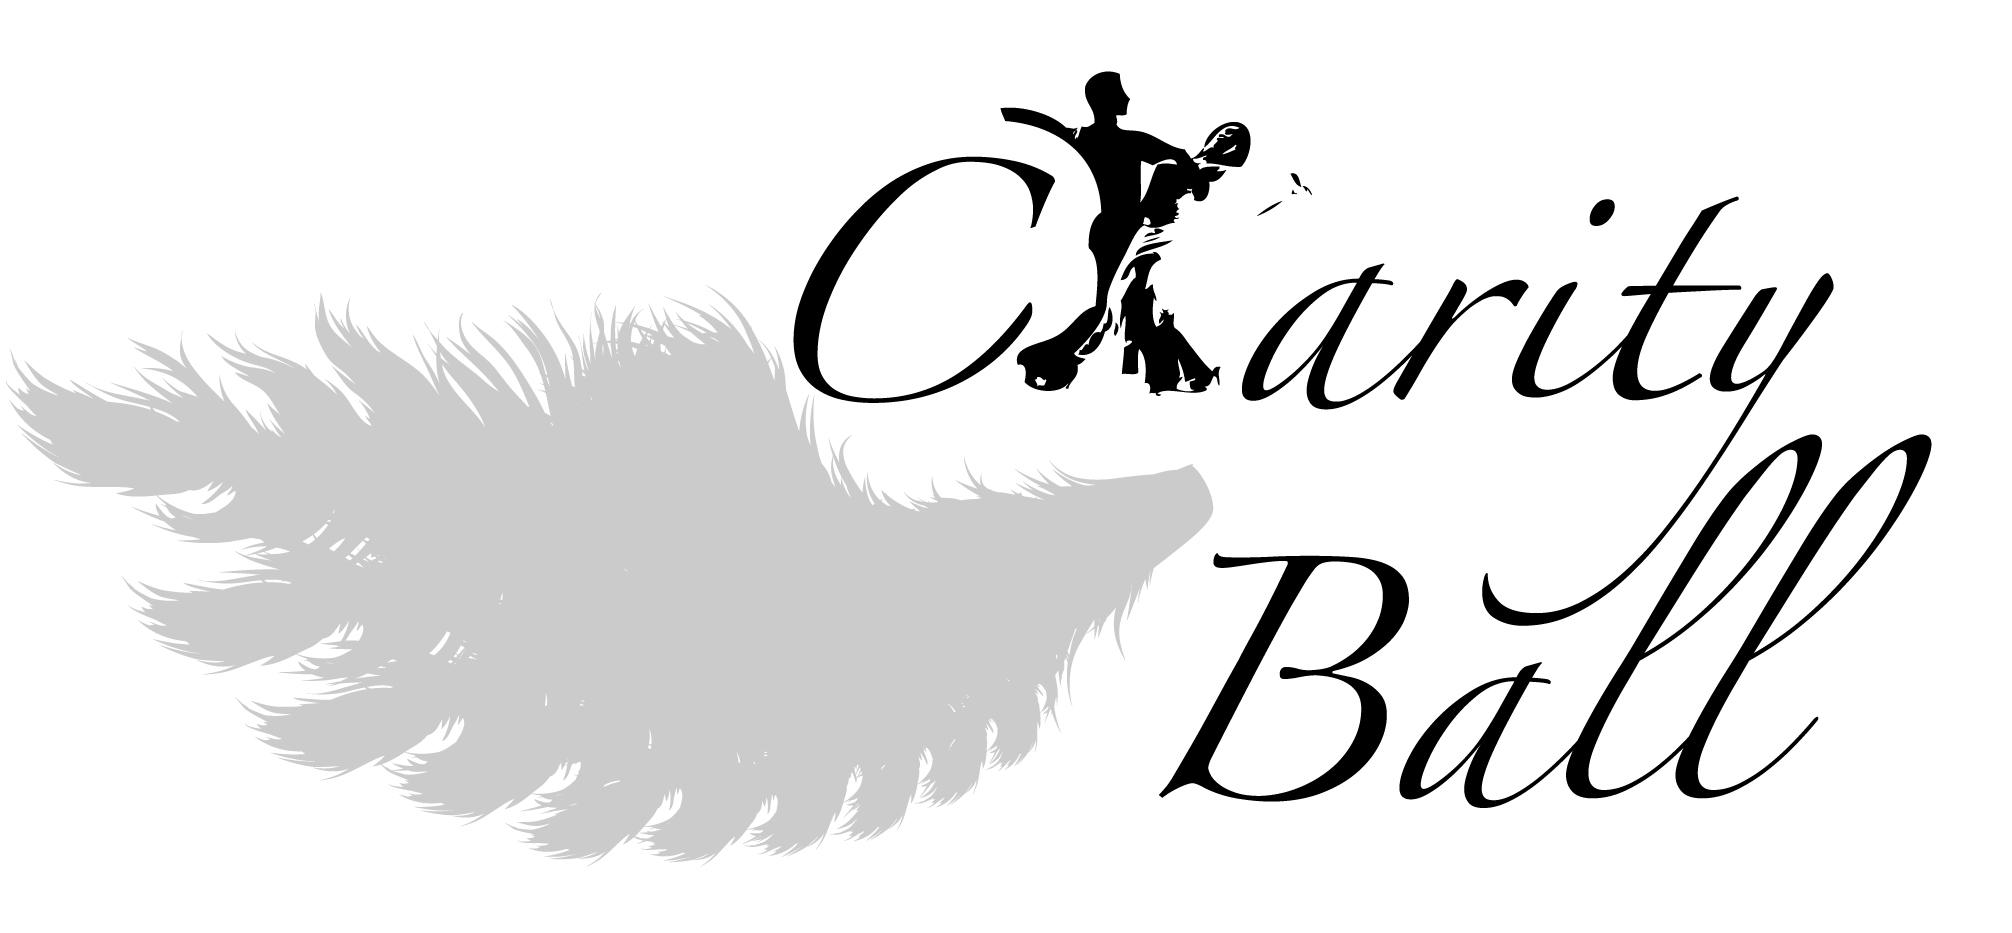 CharityBallIdeas.jpg